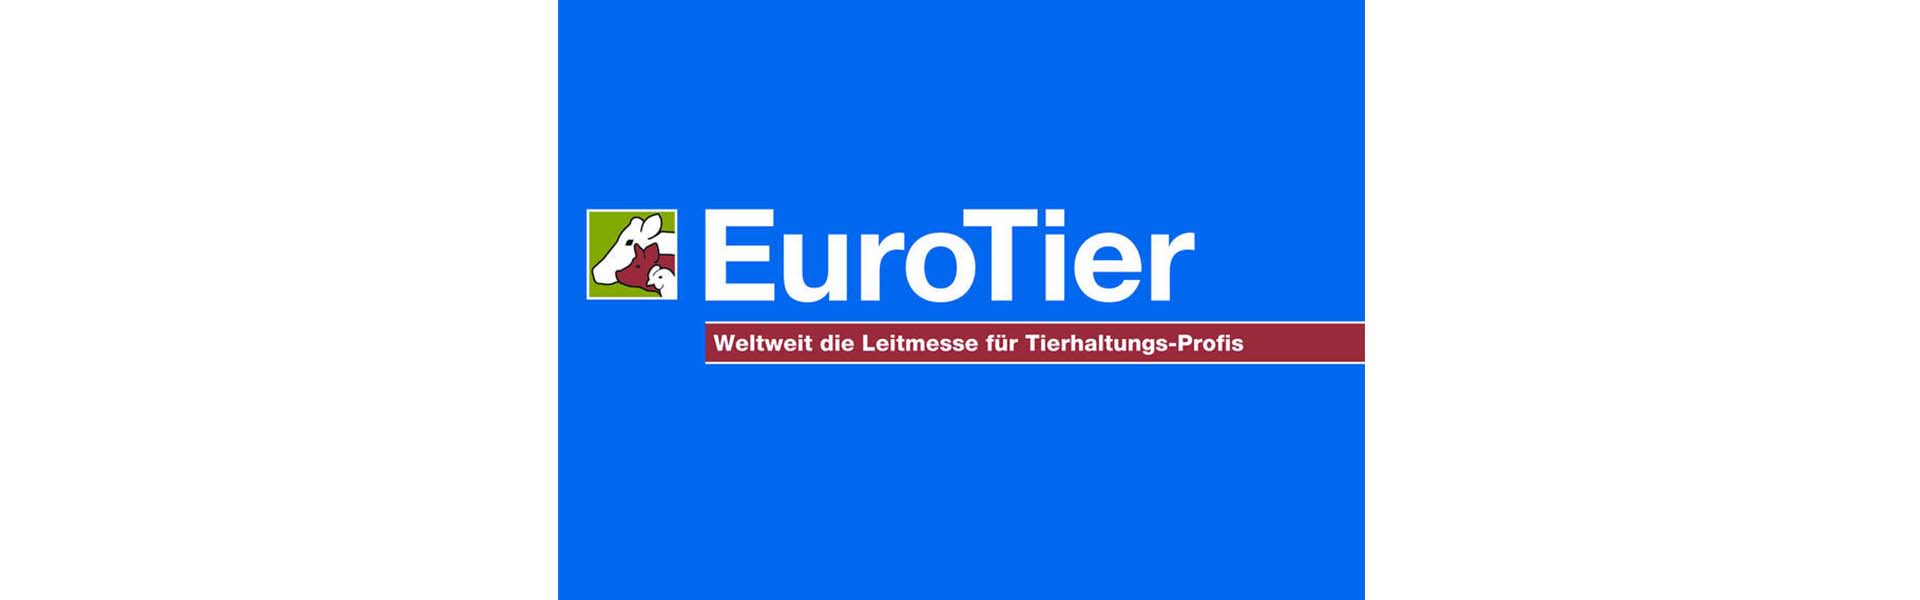 Eurotier 2018 - PlanET Biogastechnik GmbH